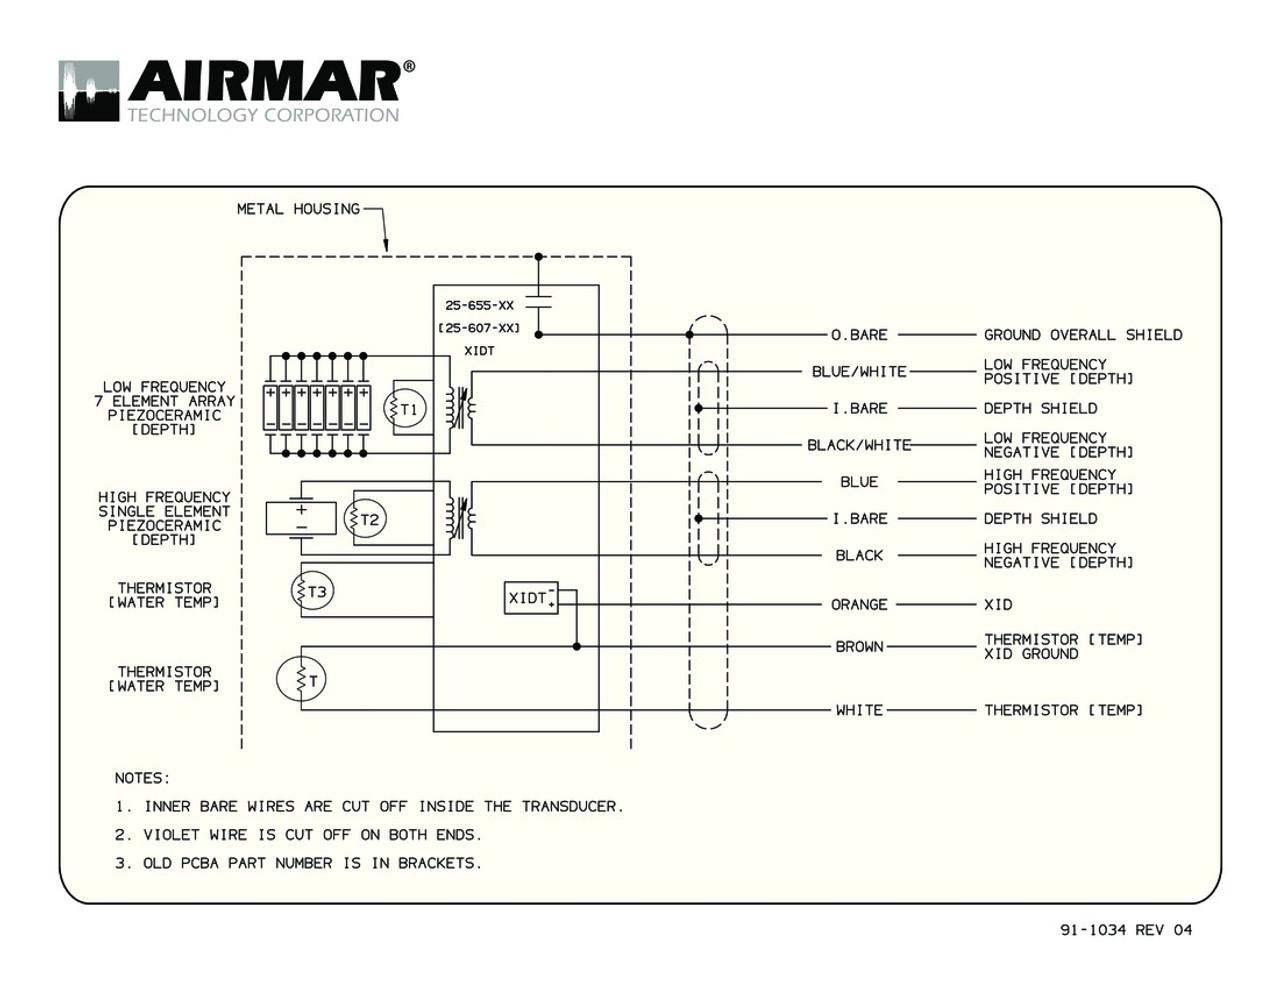 small resolution of airmar wiring diagram b265 b275 blue bottle marine gm oxygen sensor wiring diagrams airmar wiring diagrams